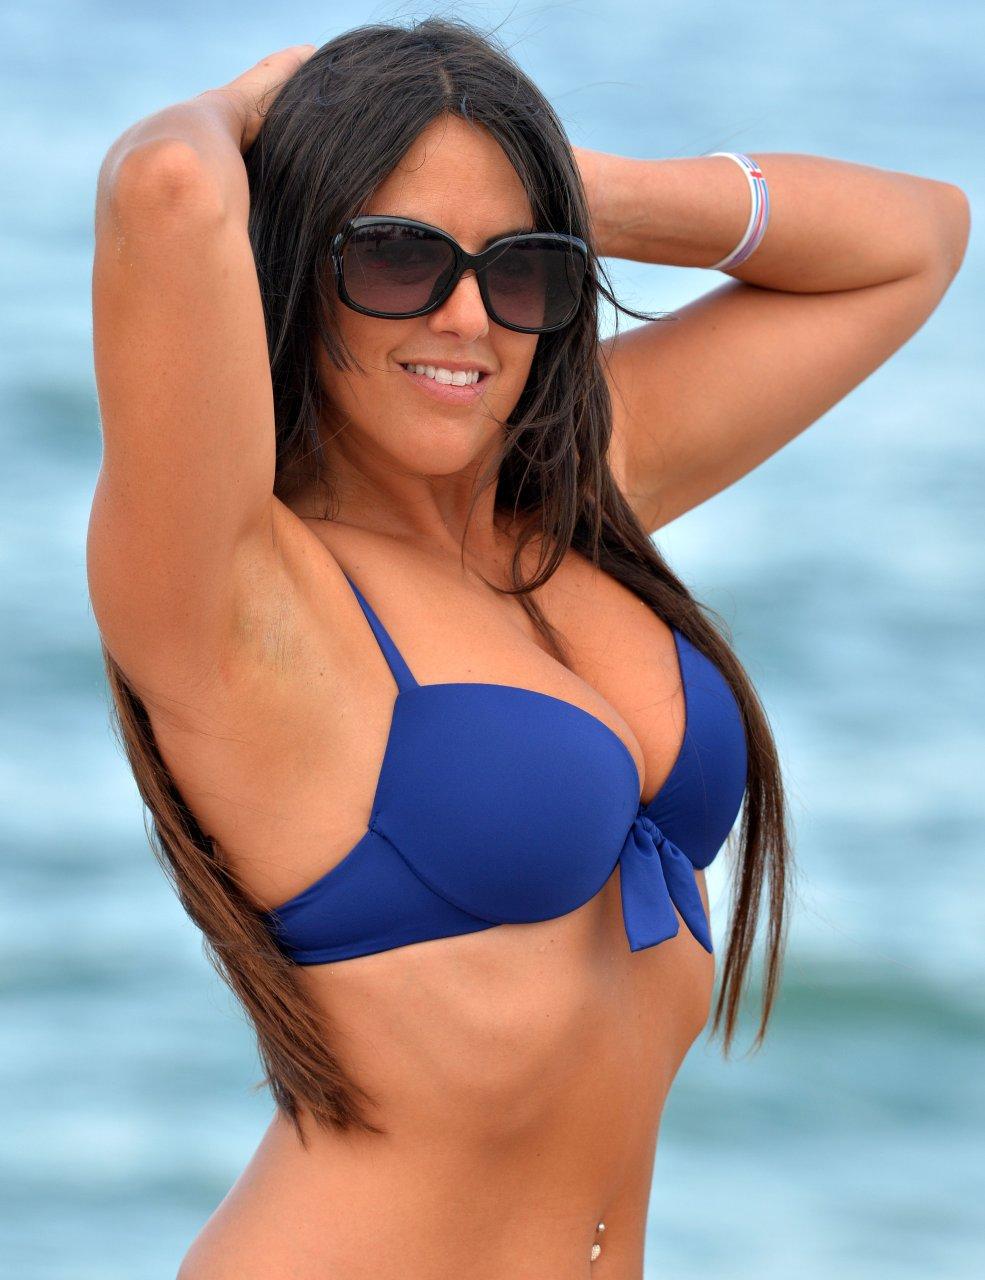 Claudia Romani nudes (83 foto) Young, Snapchat, panties